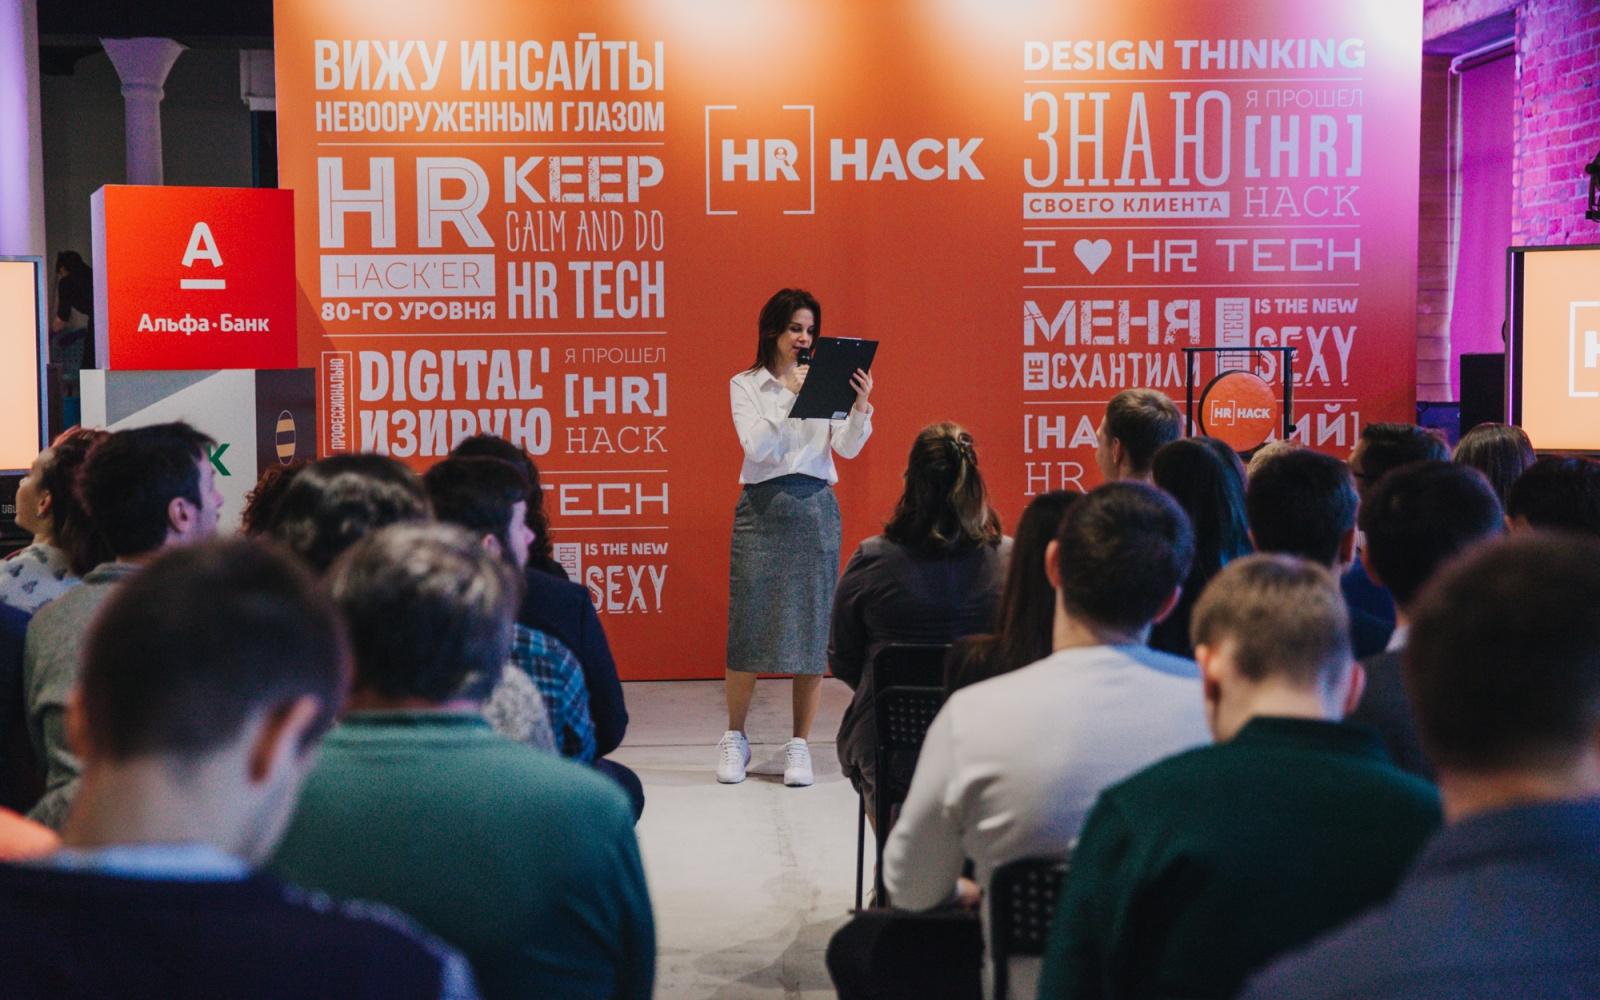 Итоги хакатона HR-hack - 1